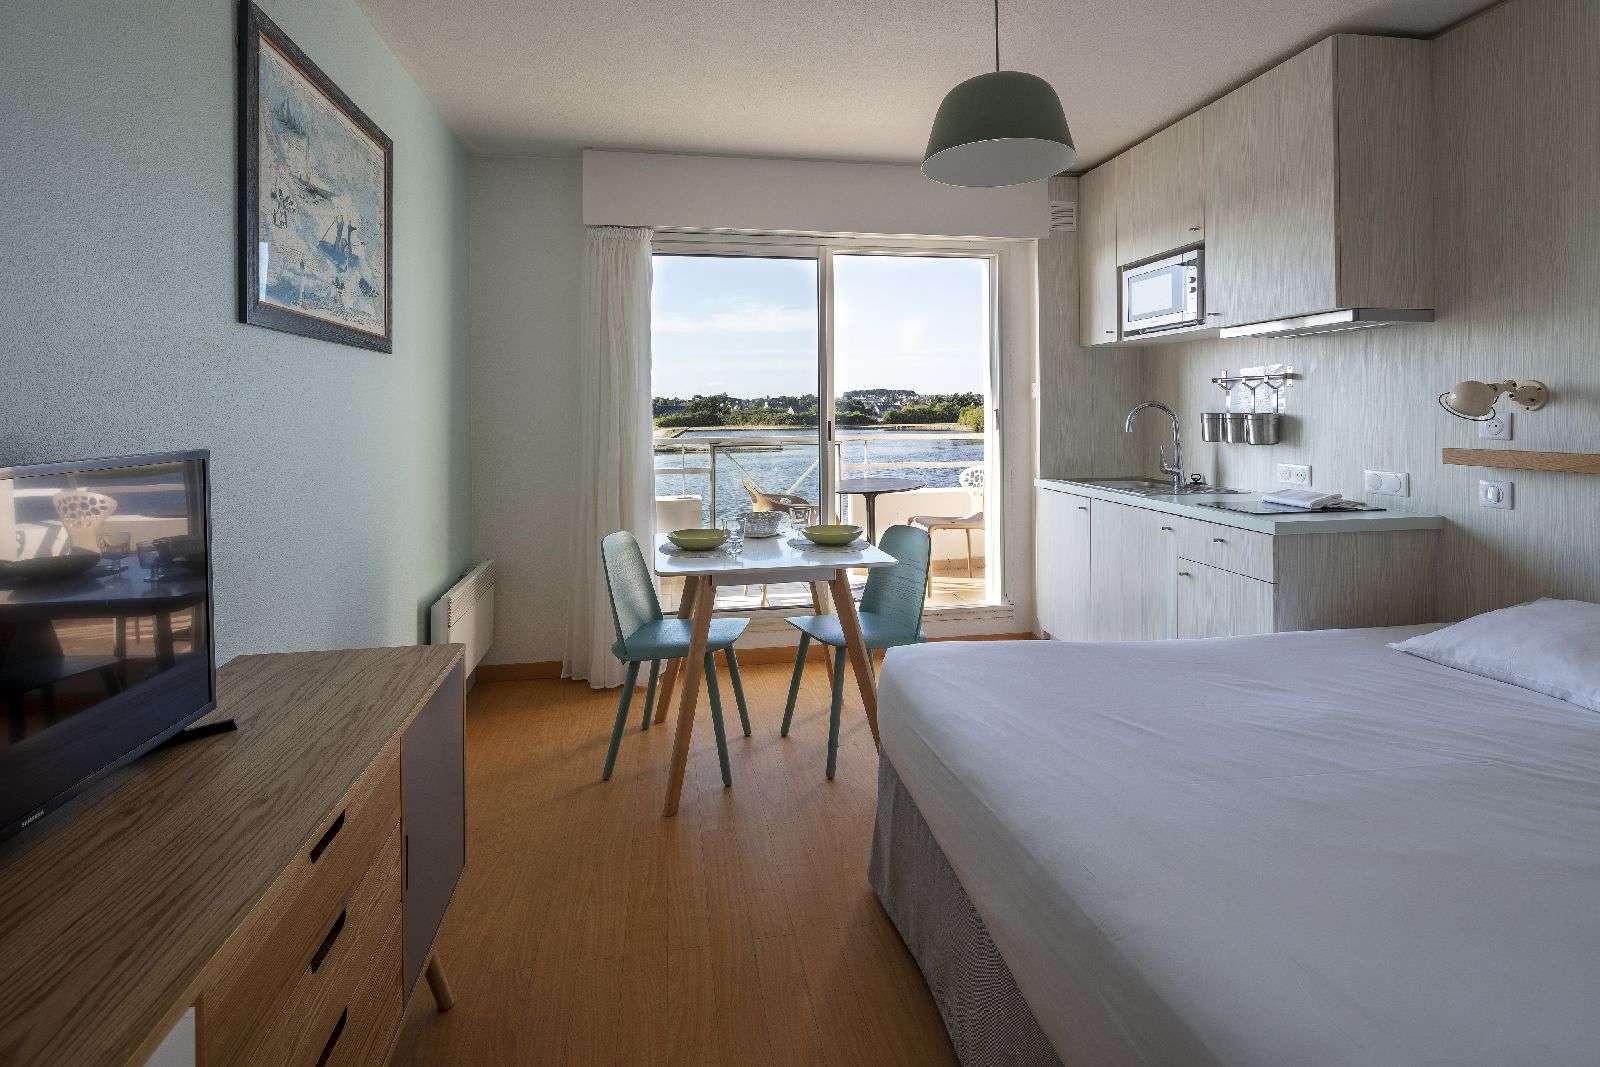 chambre_hebergement_residence-thalazur_carnac_Morbihan-Bretagne-Sud